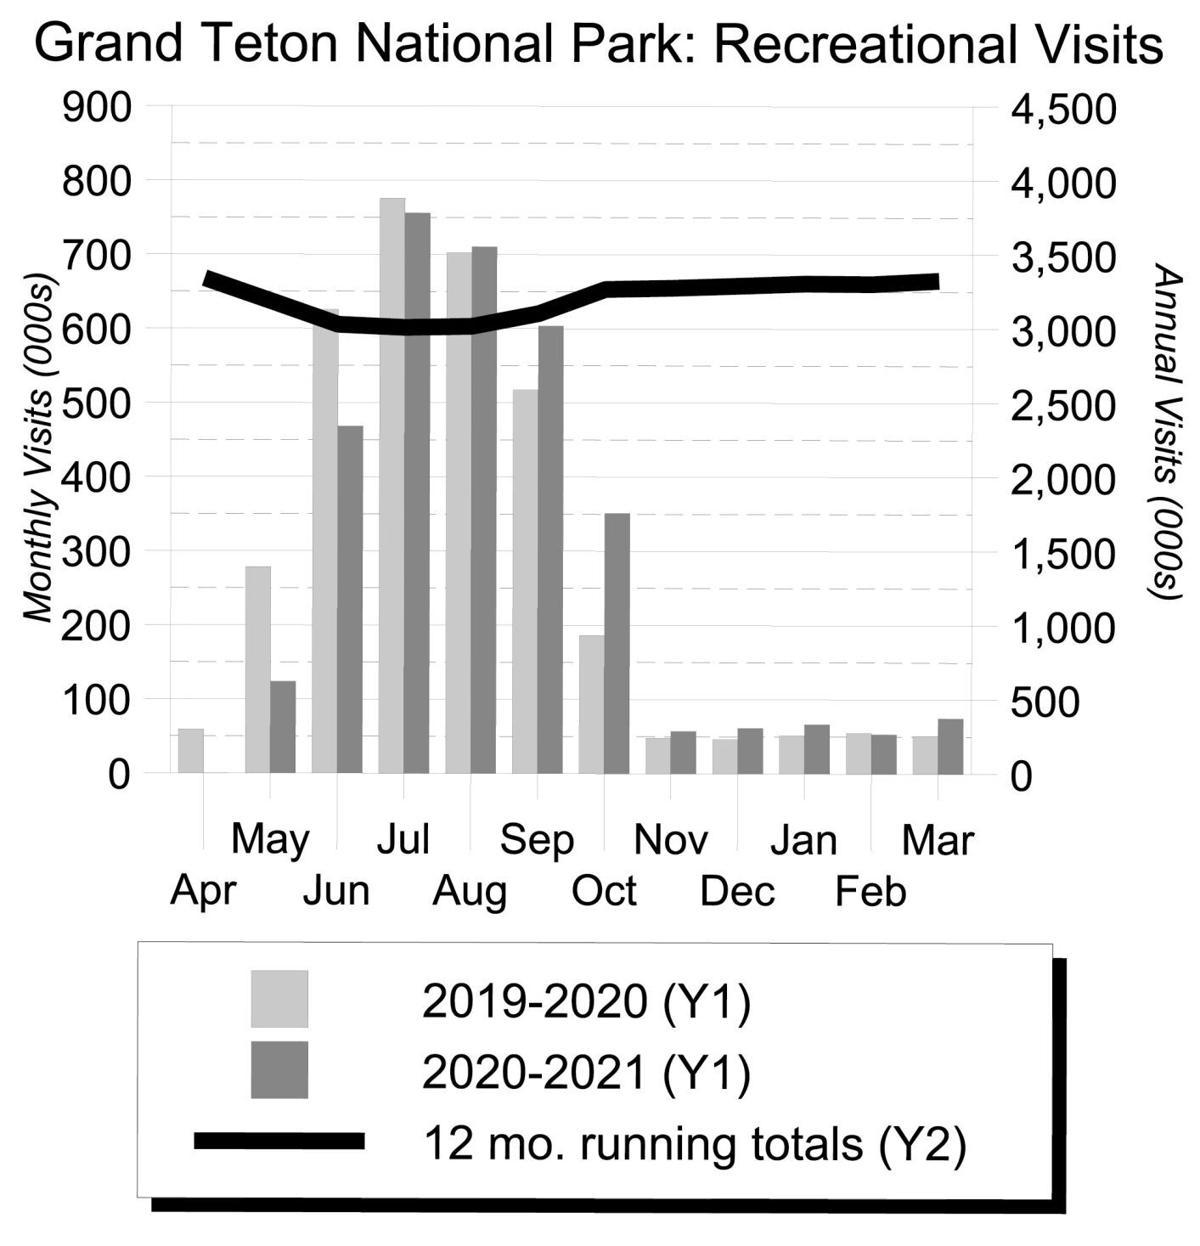 Grand Teton: Recreational Visits